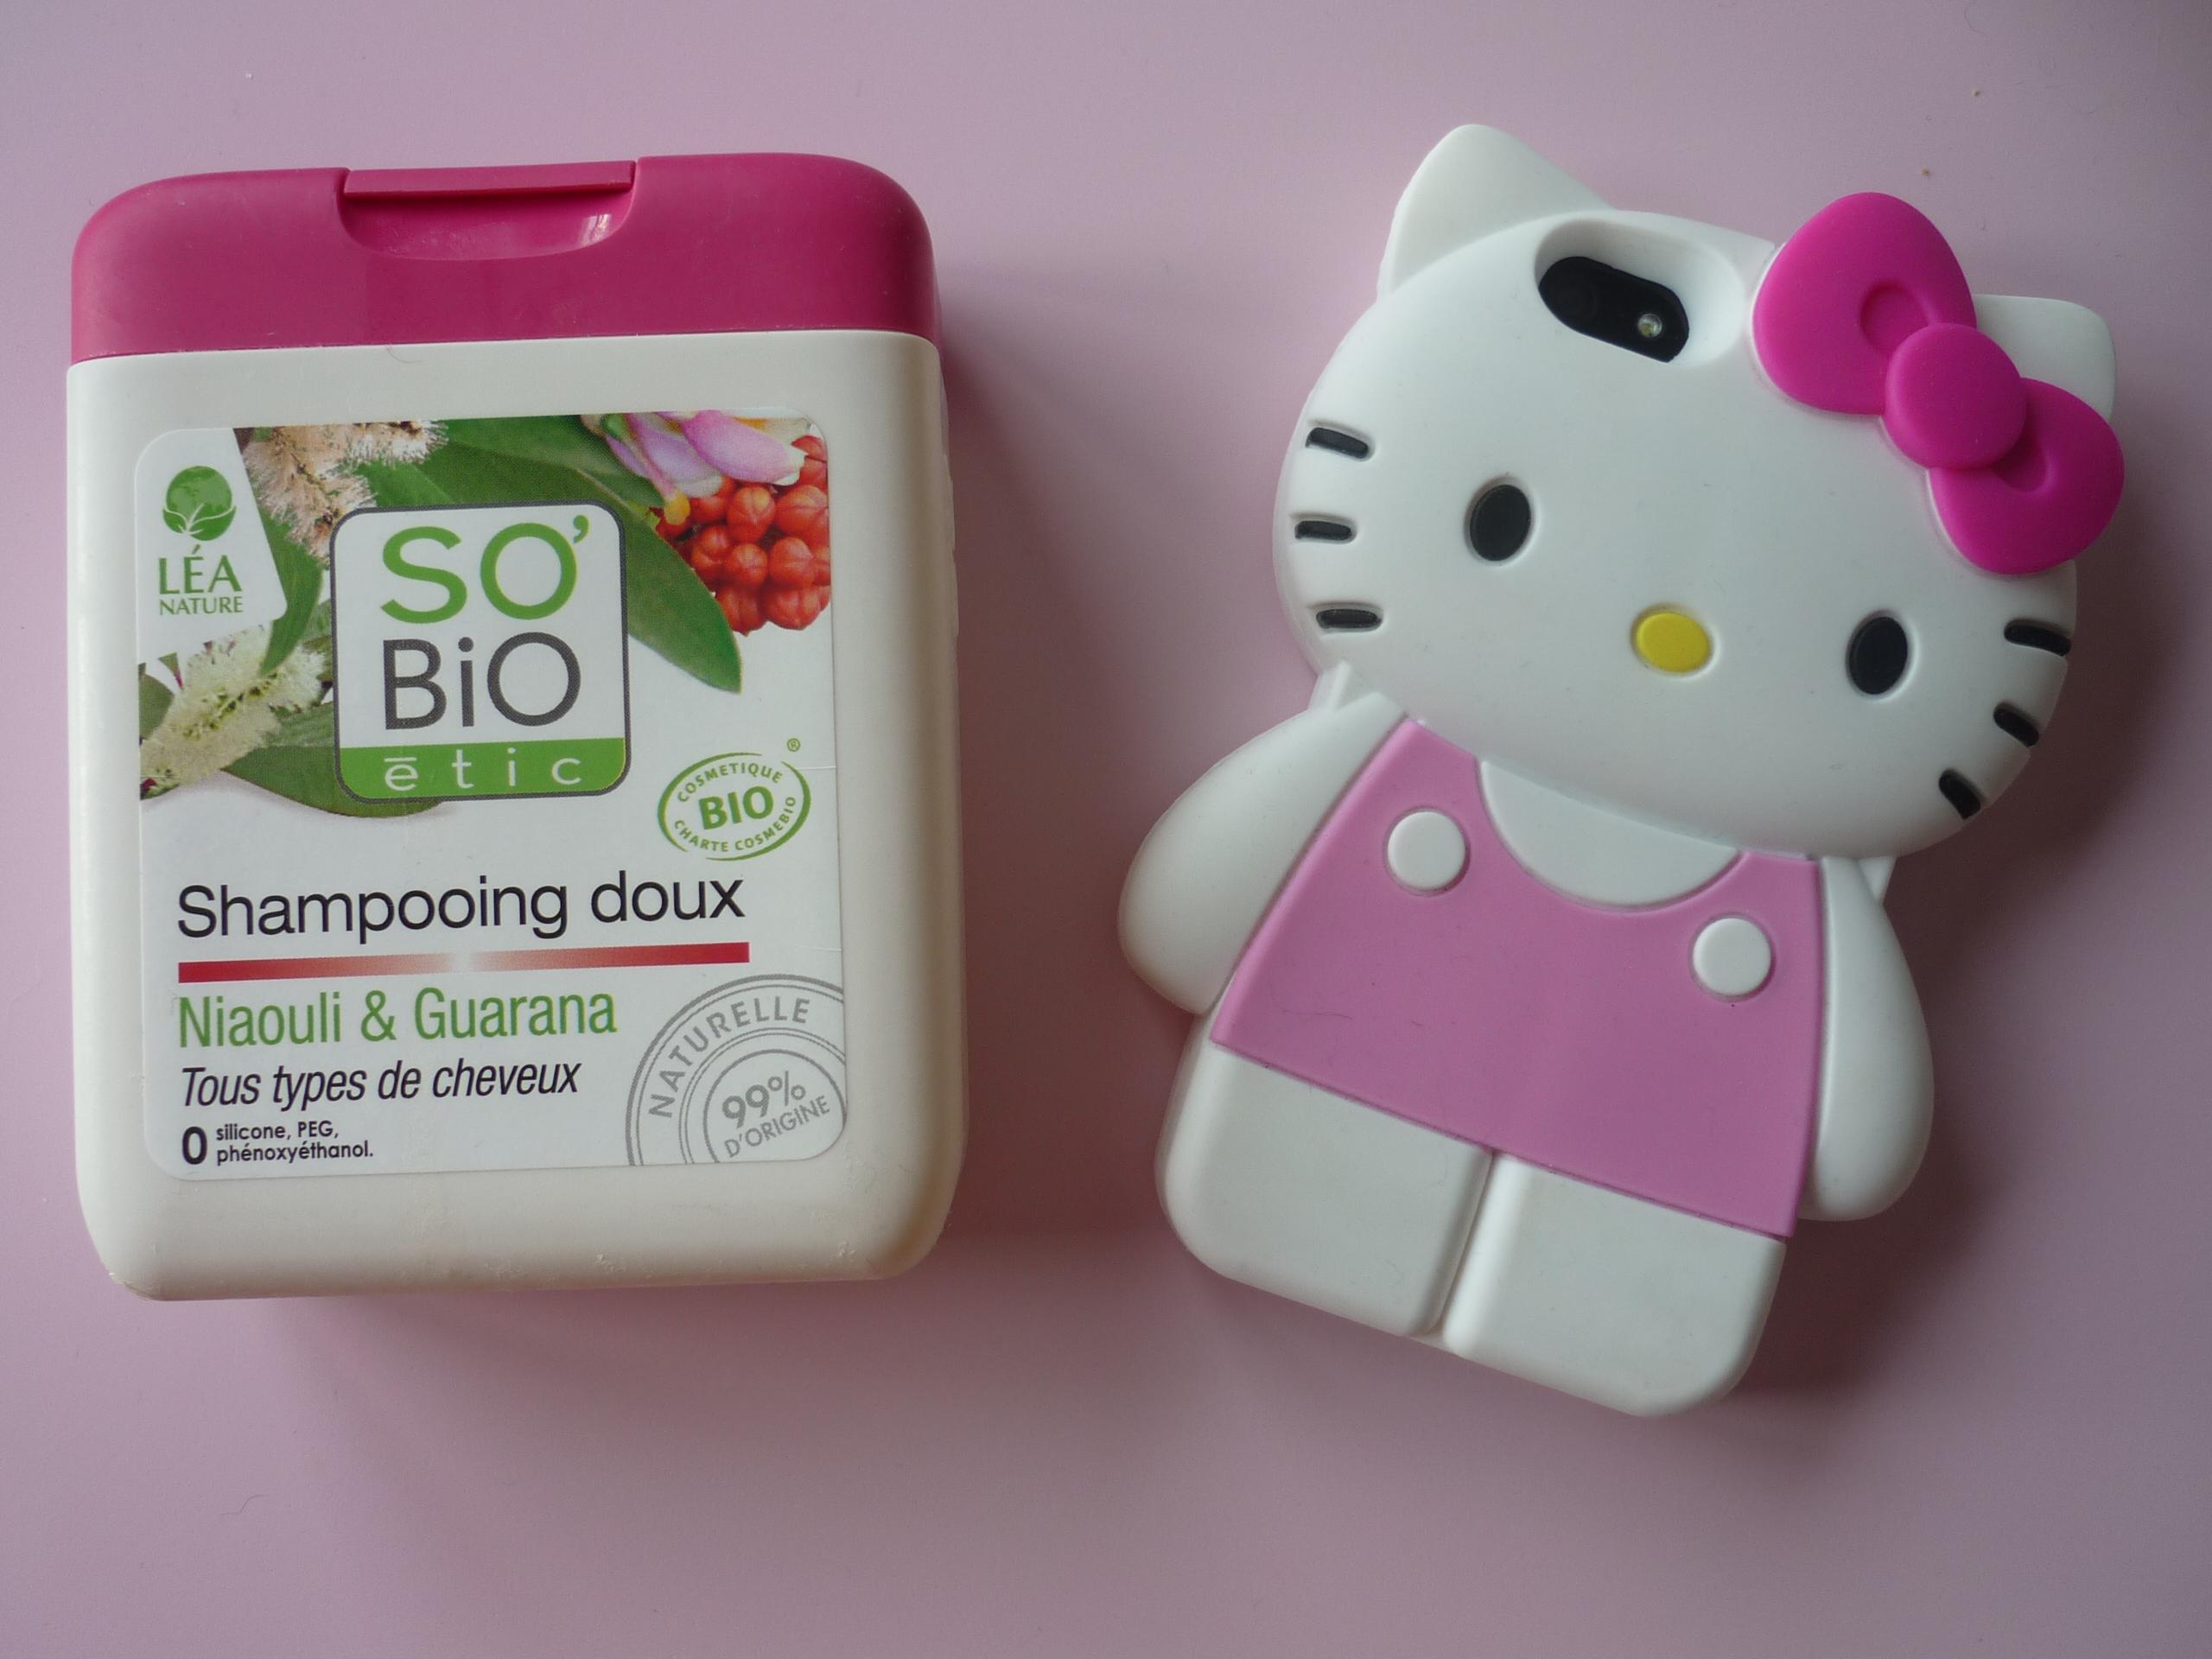 Shampooing niaouli So Bio Etic